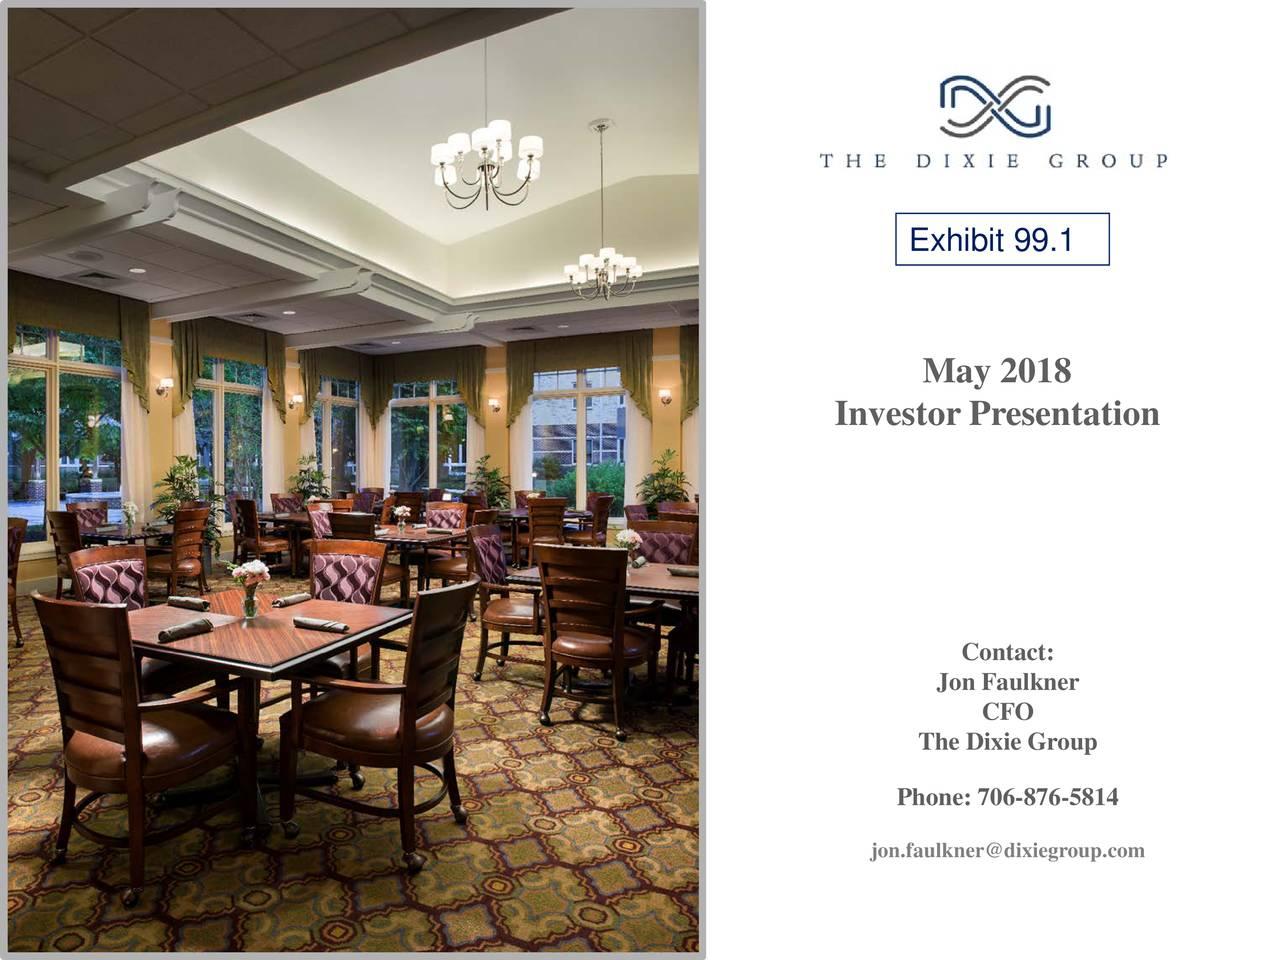 May 2018 Investor Presentation Contact: Jon Faulkner CFO The Dixie Group Phone: 706-876-5814 jon.faulkner@dixiegroup.com